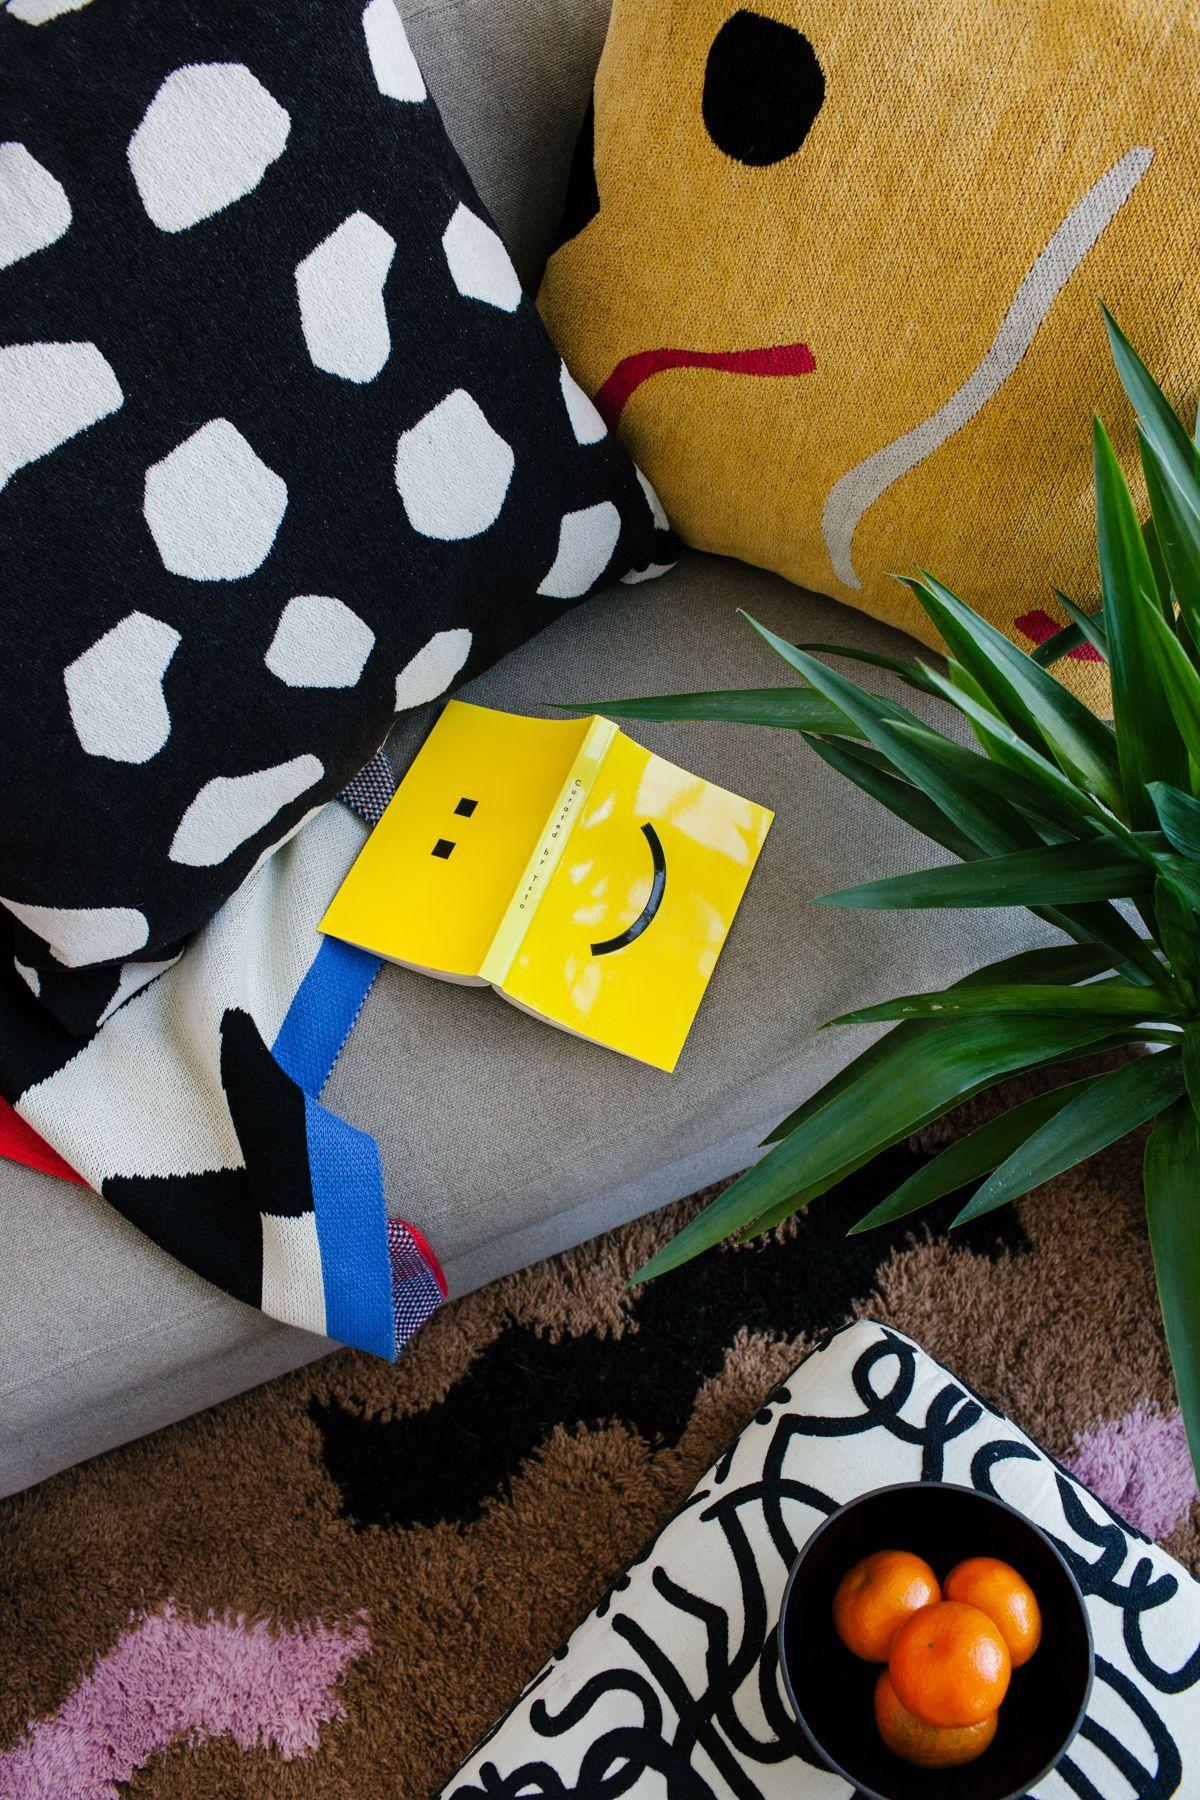 visual diary - Blogi   Lily.fi